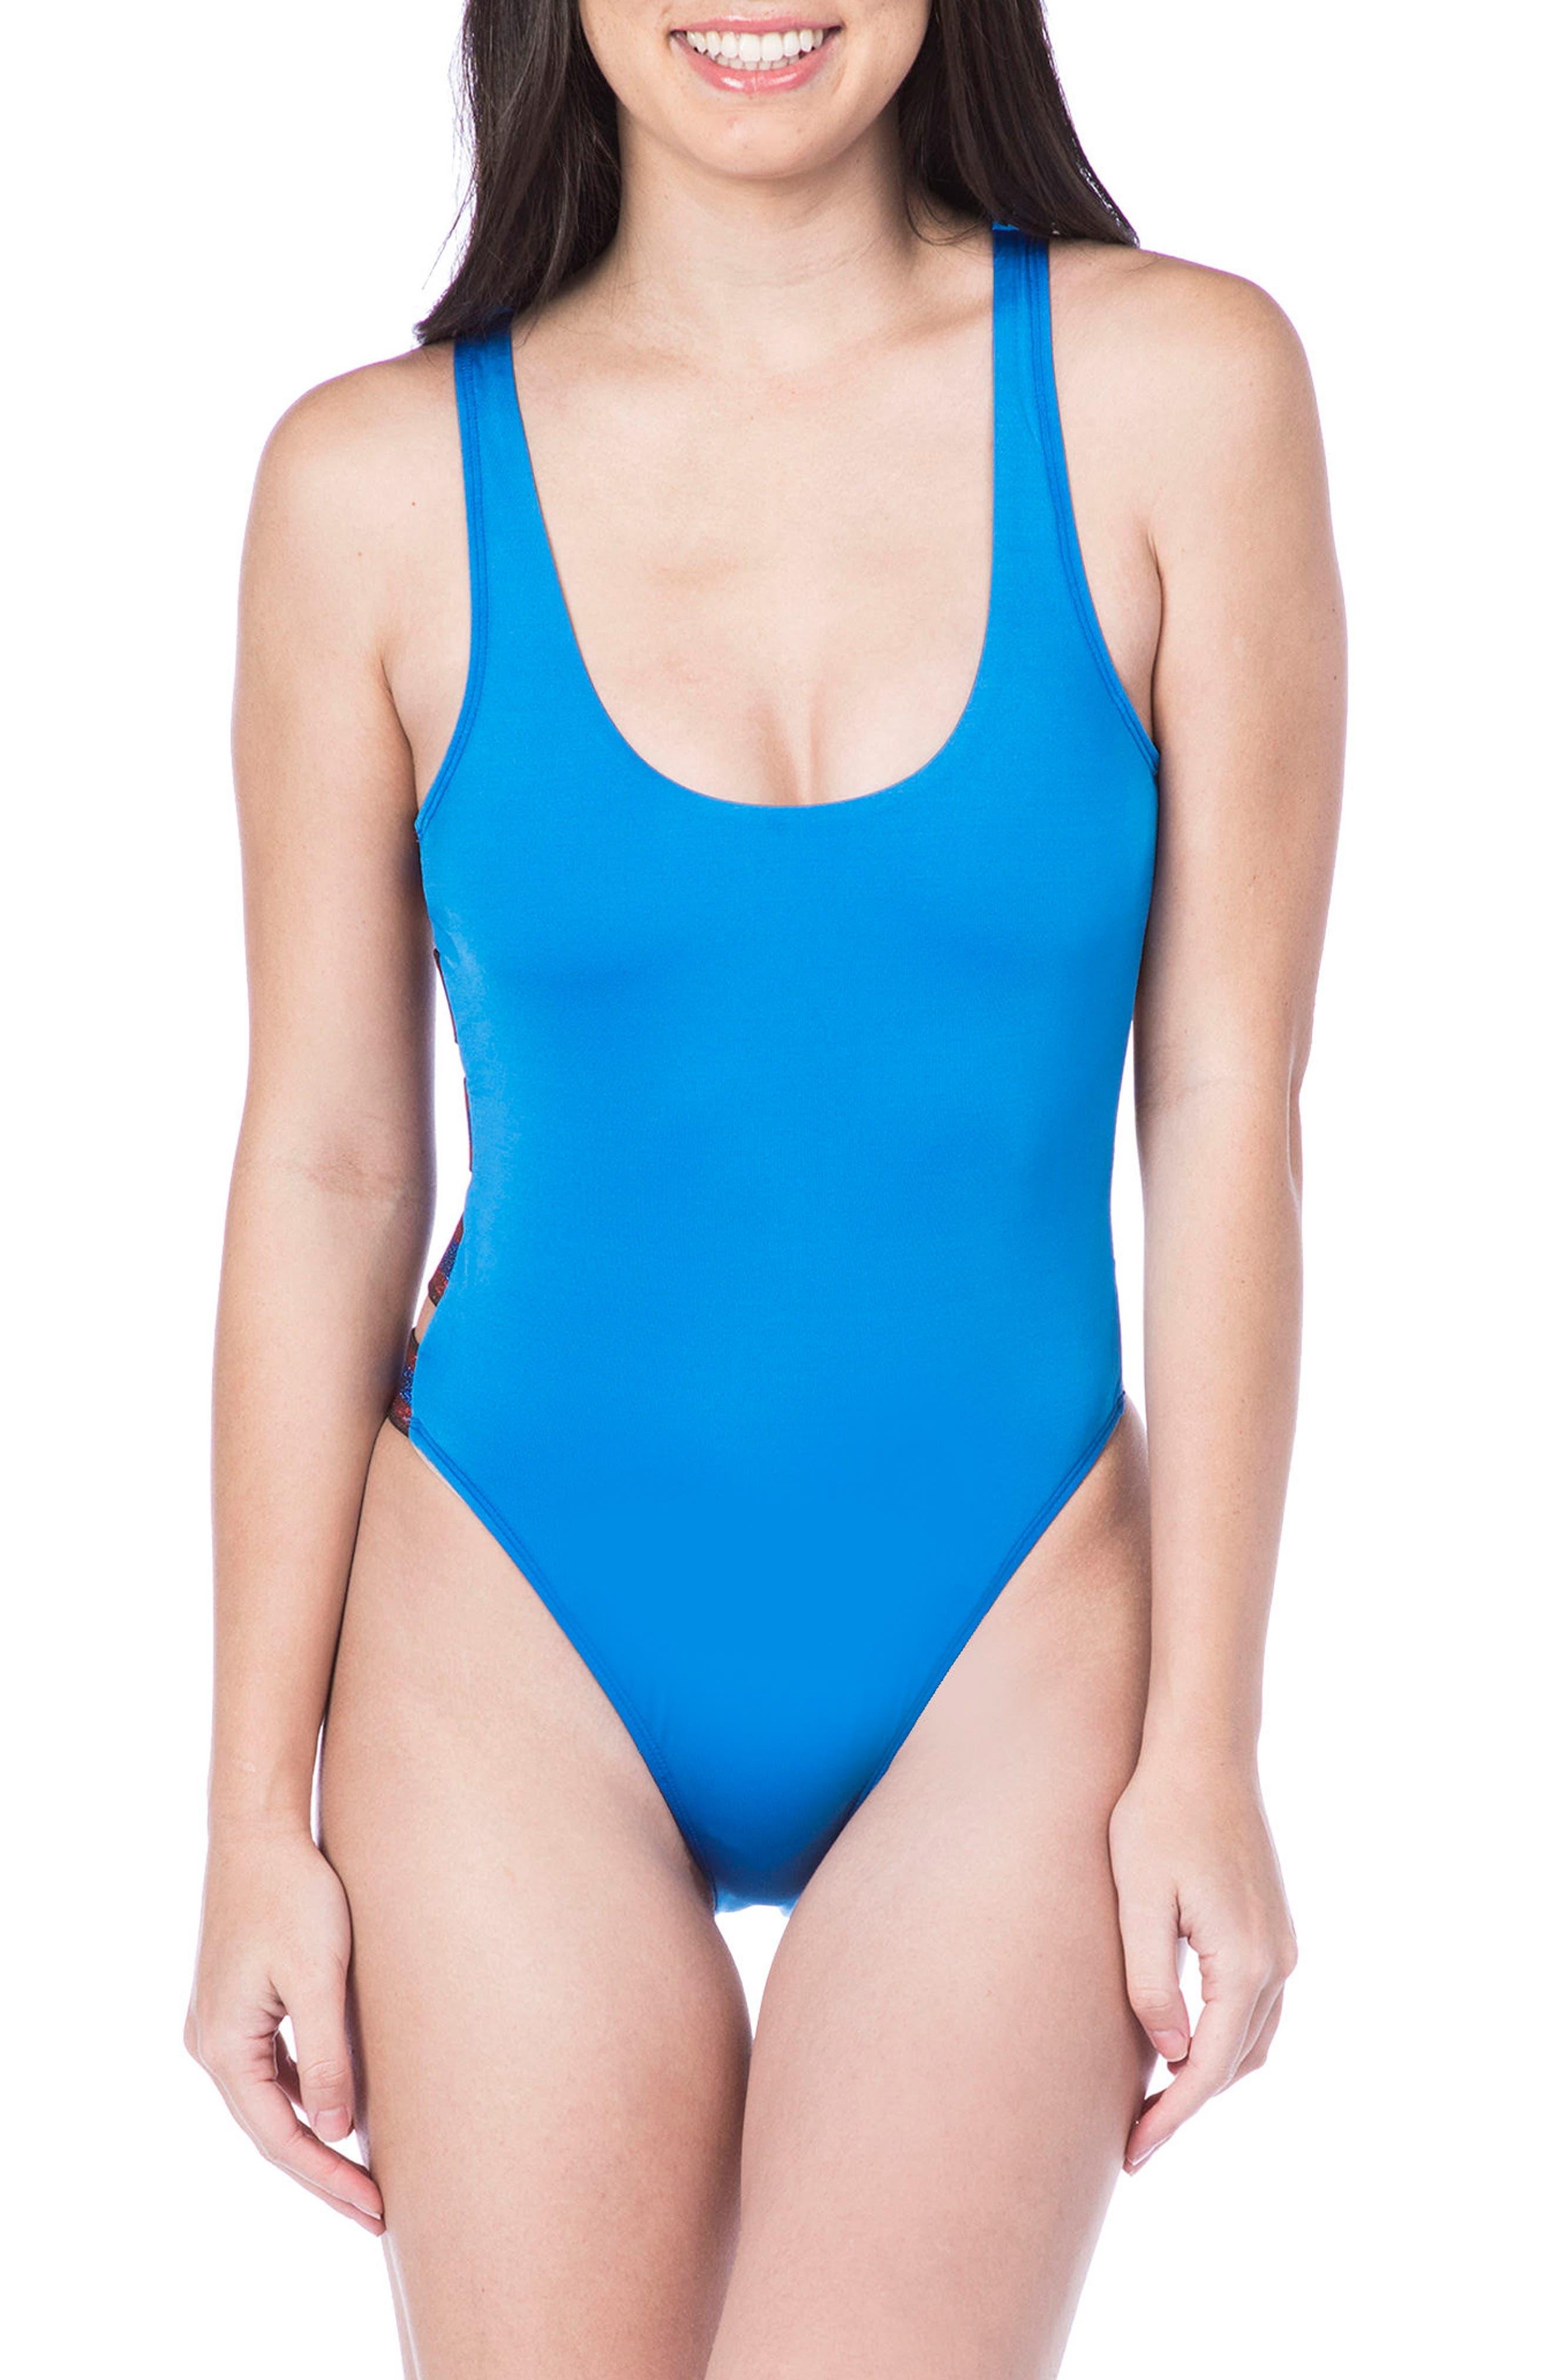 Route 66 One-Piece Swimsuit,                             Main thumbnail 1, color,                             408